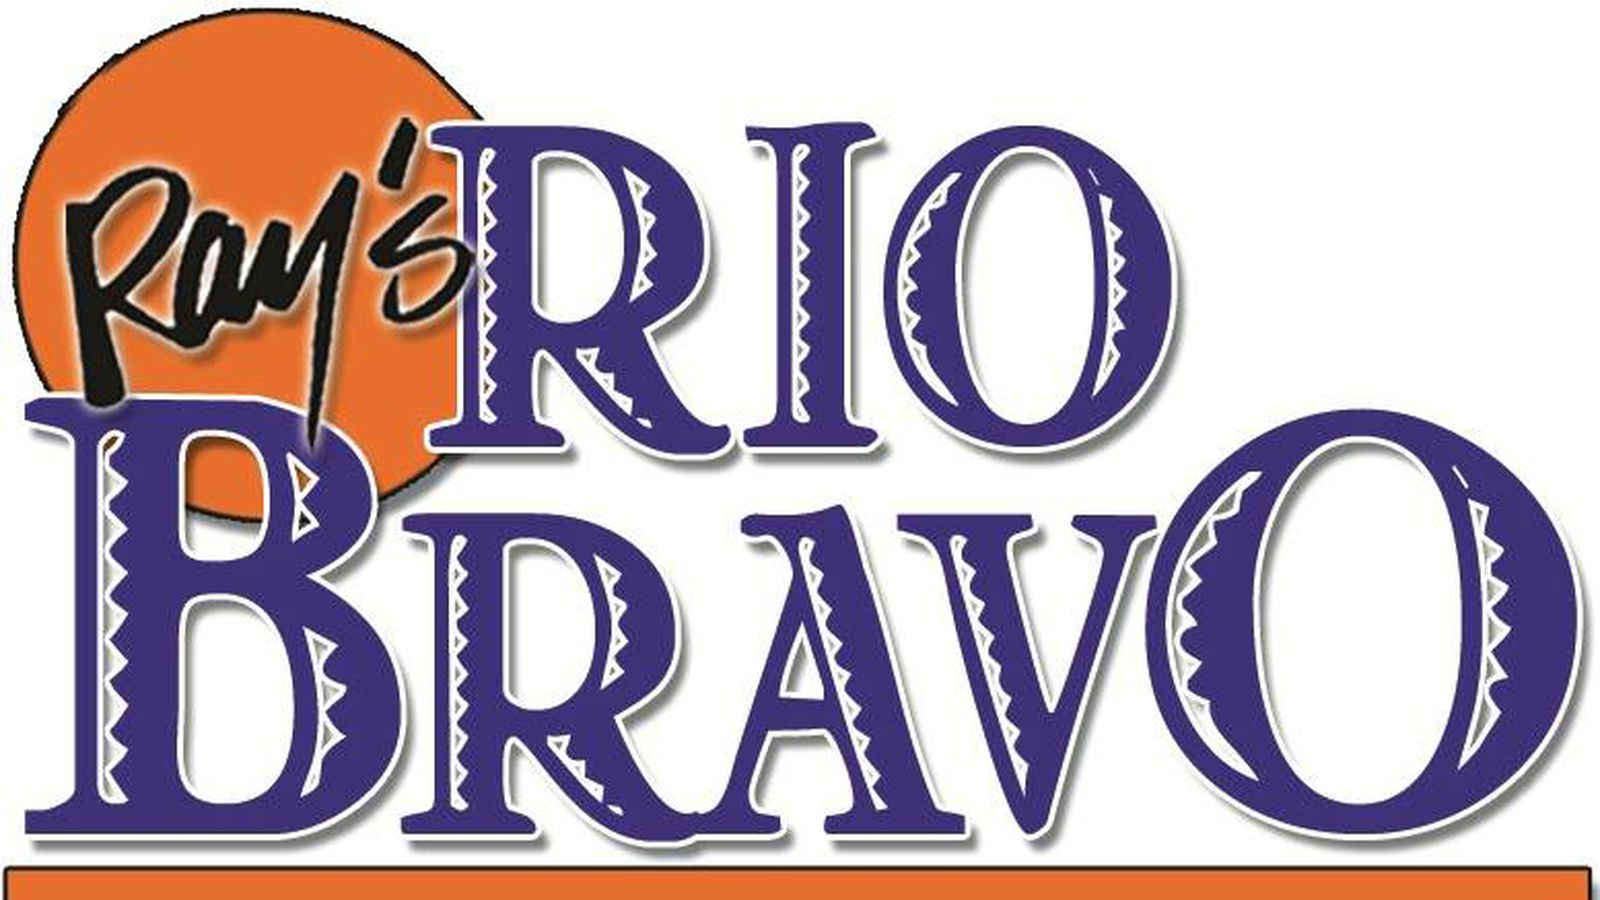 Bravo Restaurant New Orleans